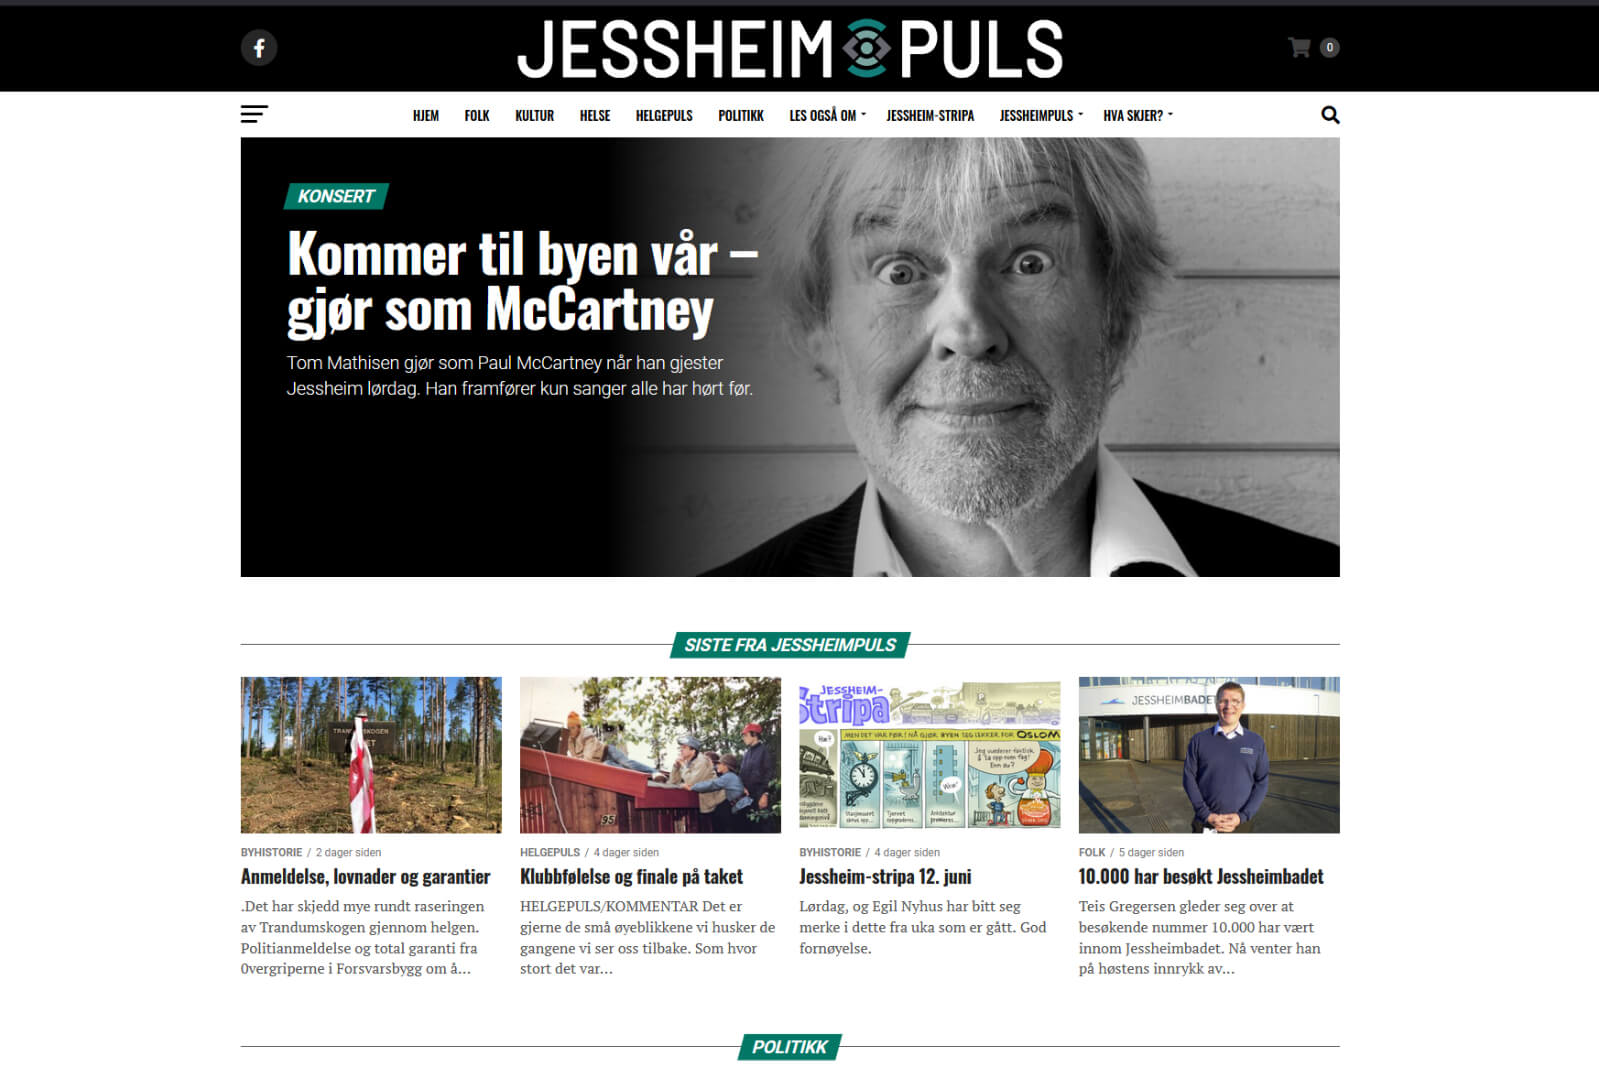 Jessheimpuls webside